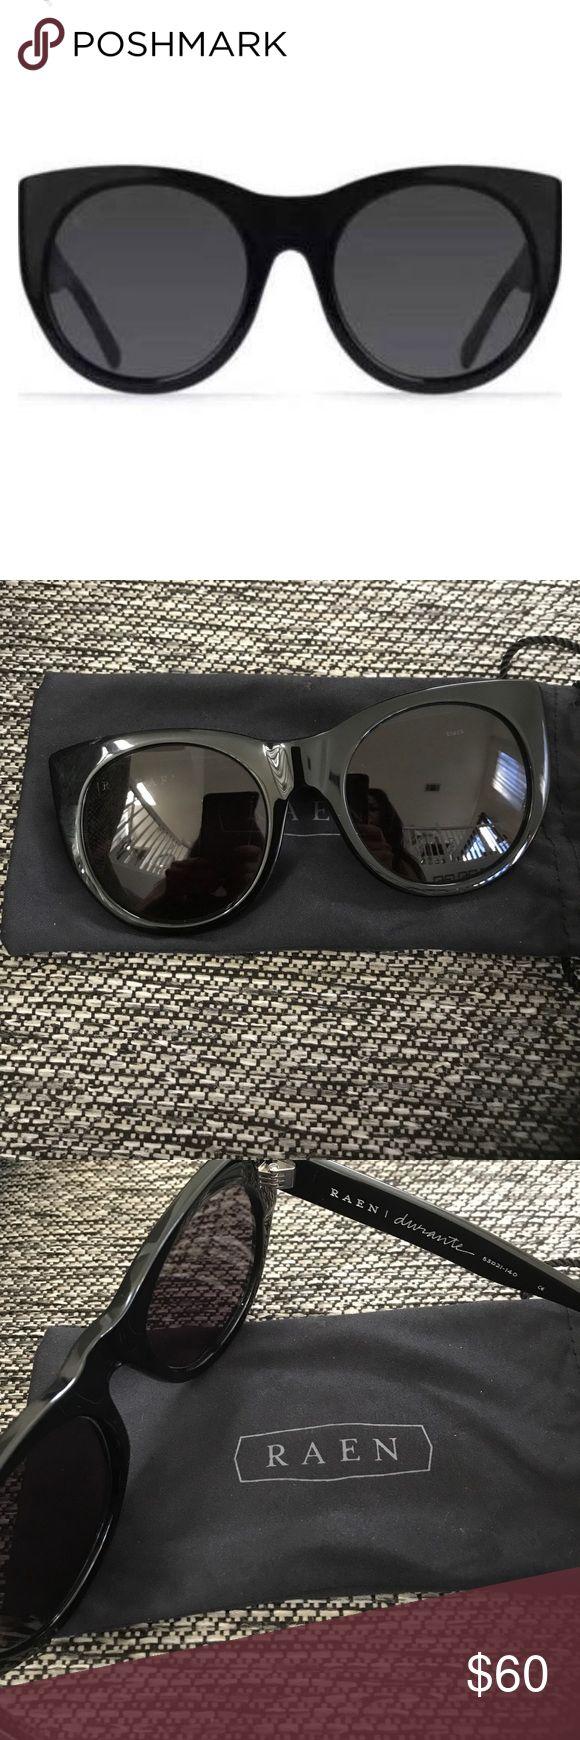 Rachel Zoe sunglasses From Rachael Zoe 2017 summer box of style new unused Rachel Zoe Accessories Sunglasses